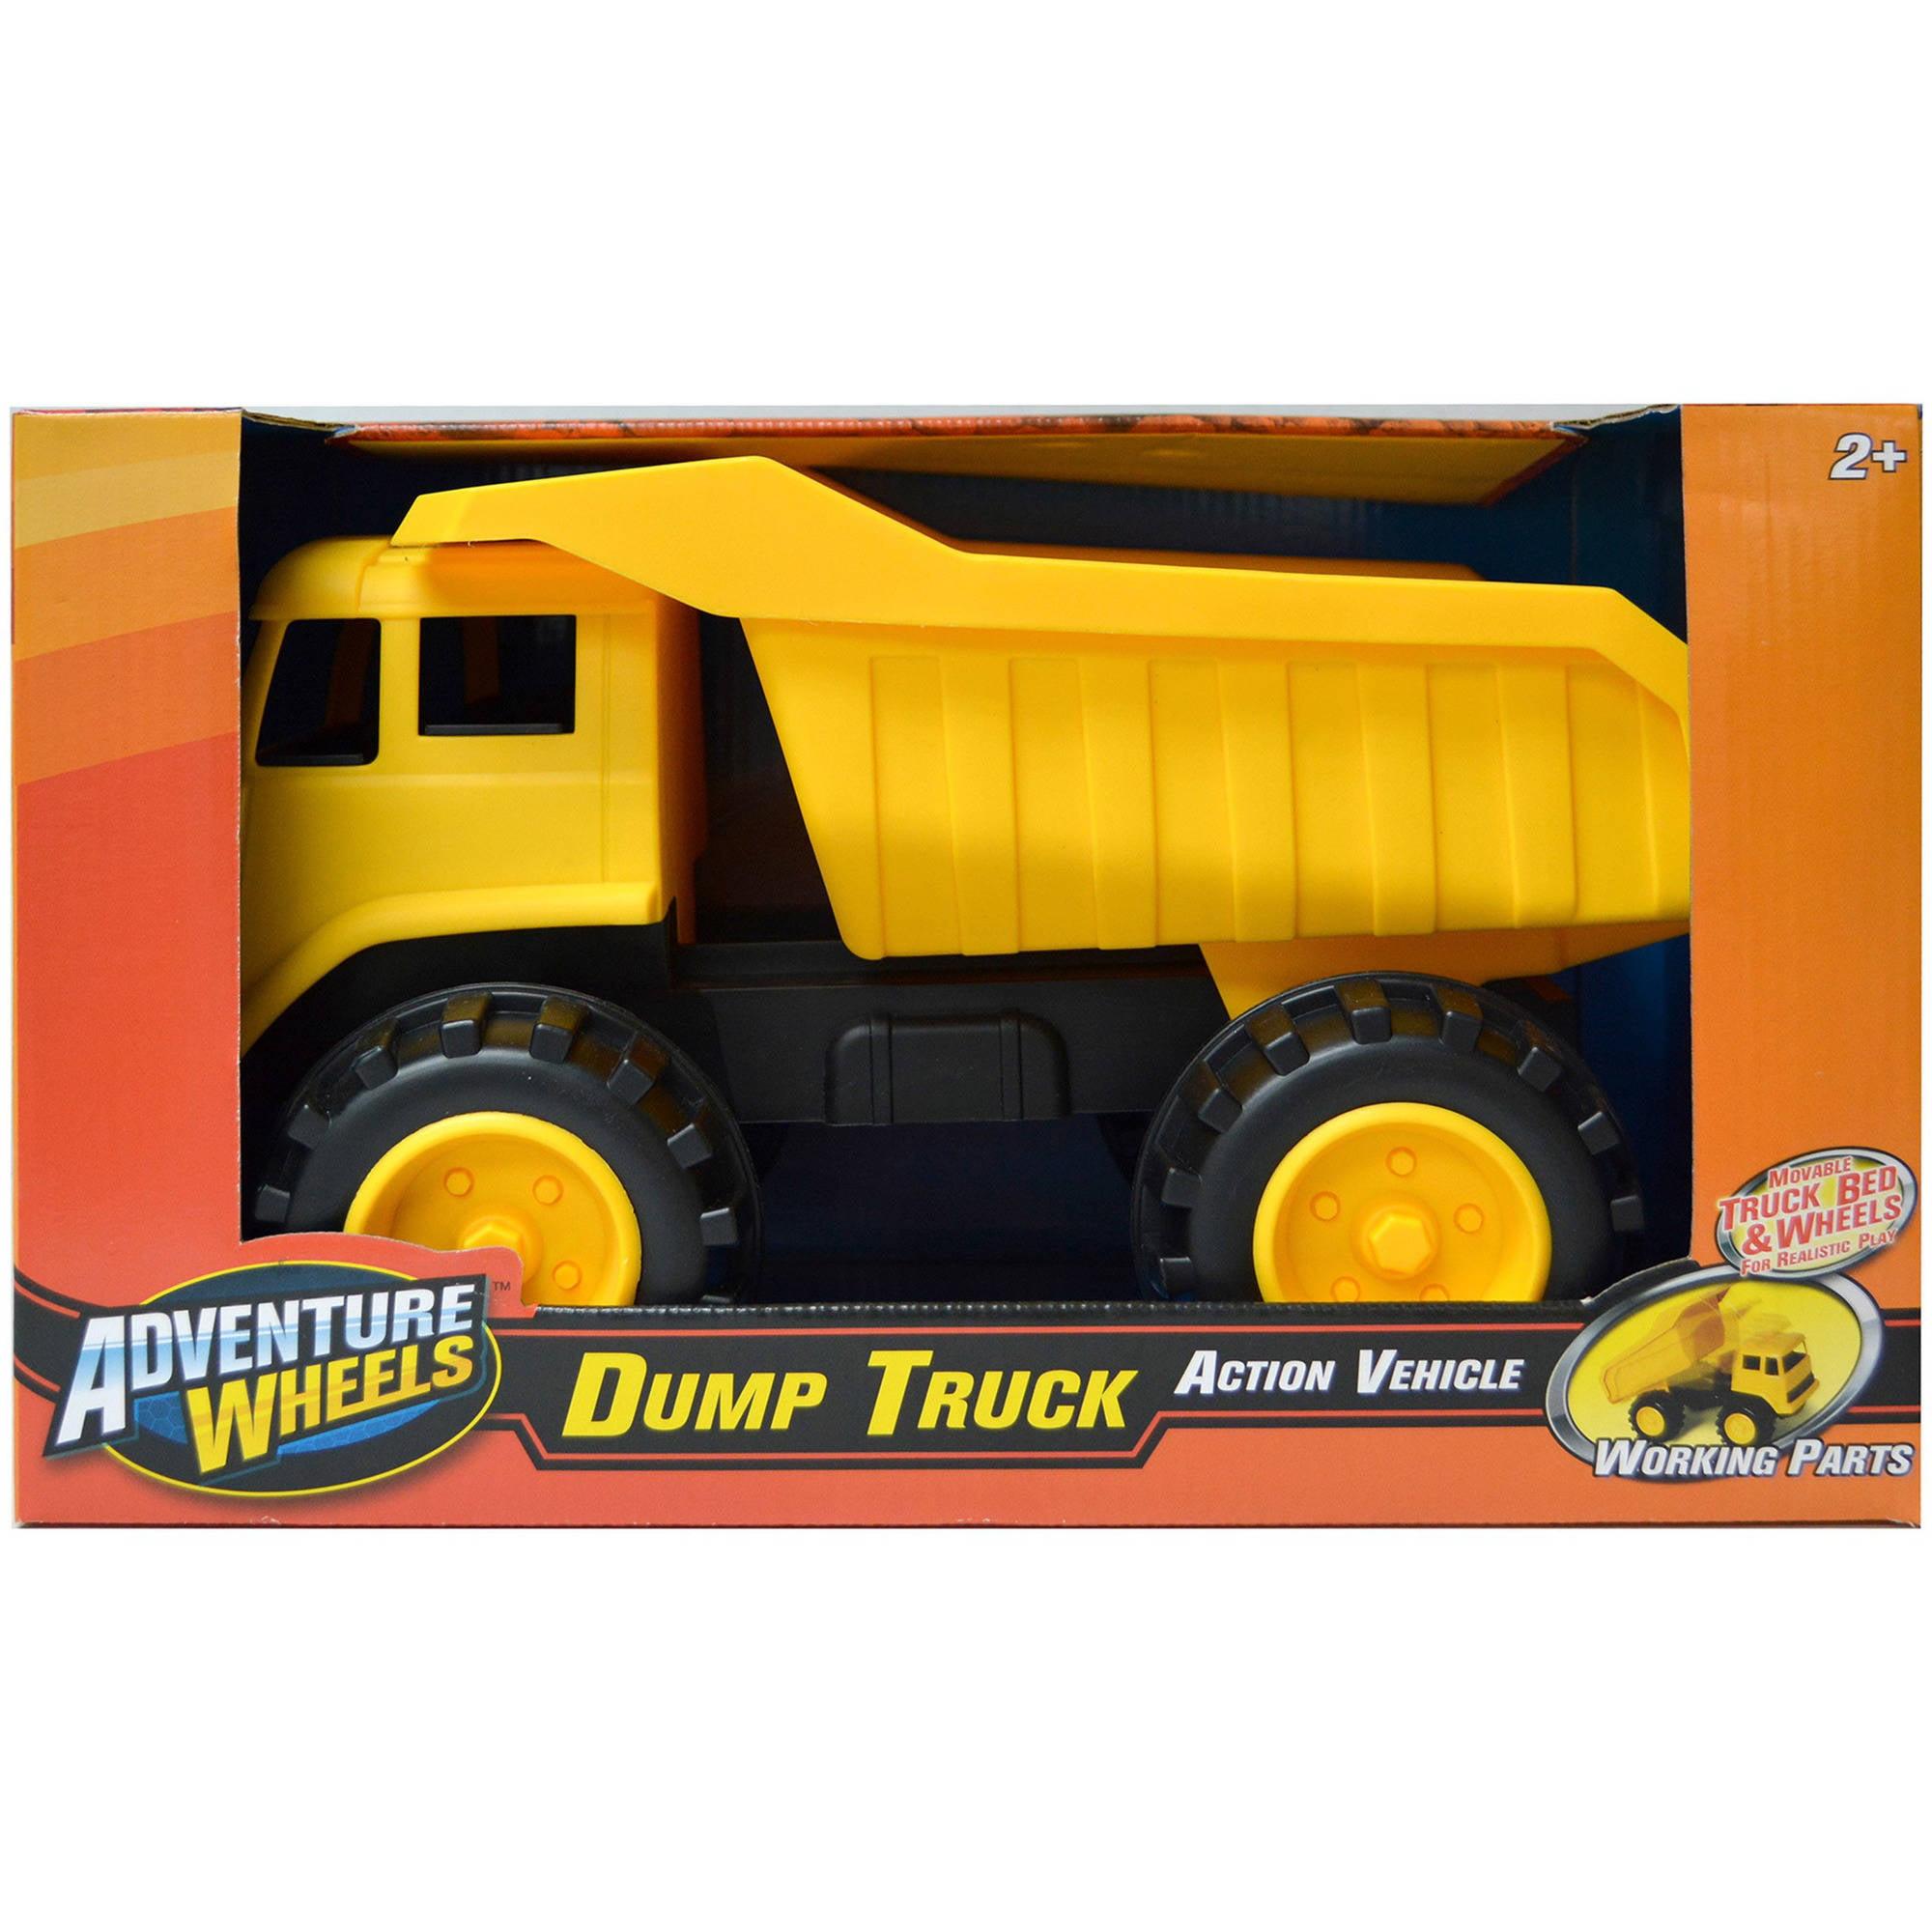 Image of Adventures Wheels Trucks